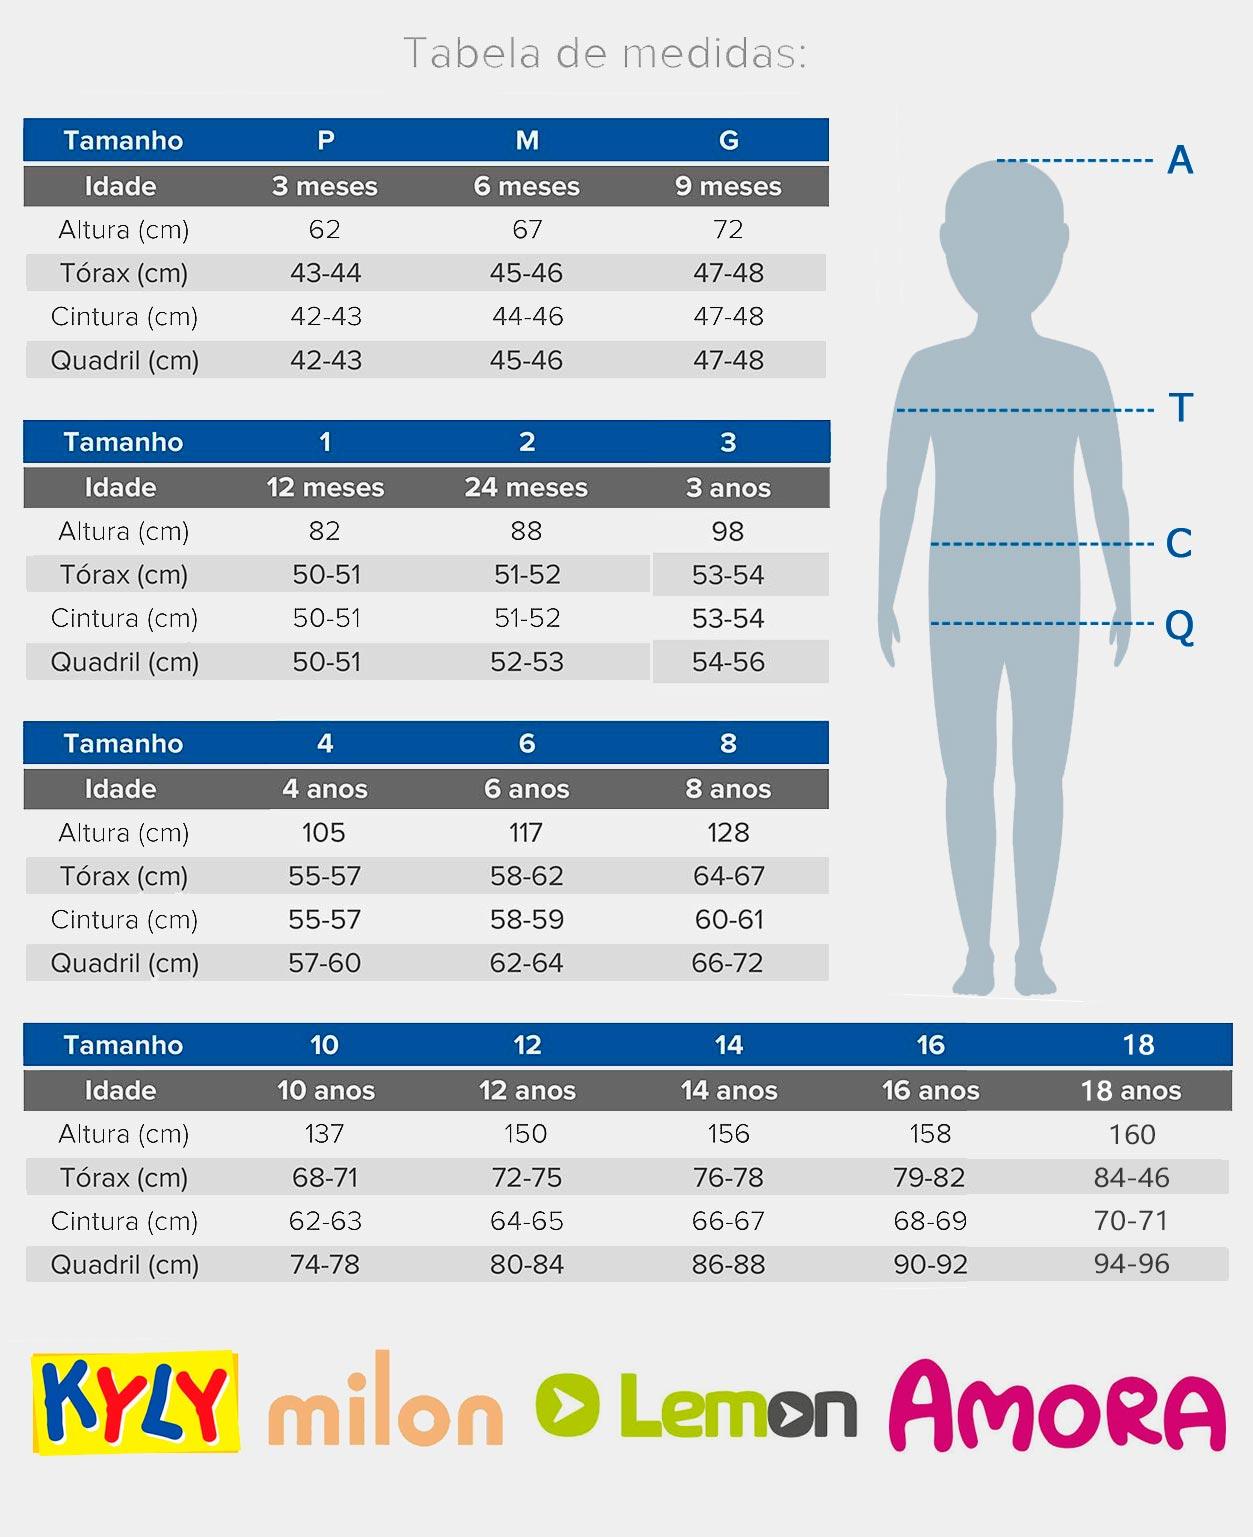 Conjunto Infantil Masculino Verão Preto Skate Kyly: Tabela de medidas